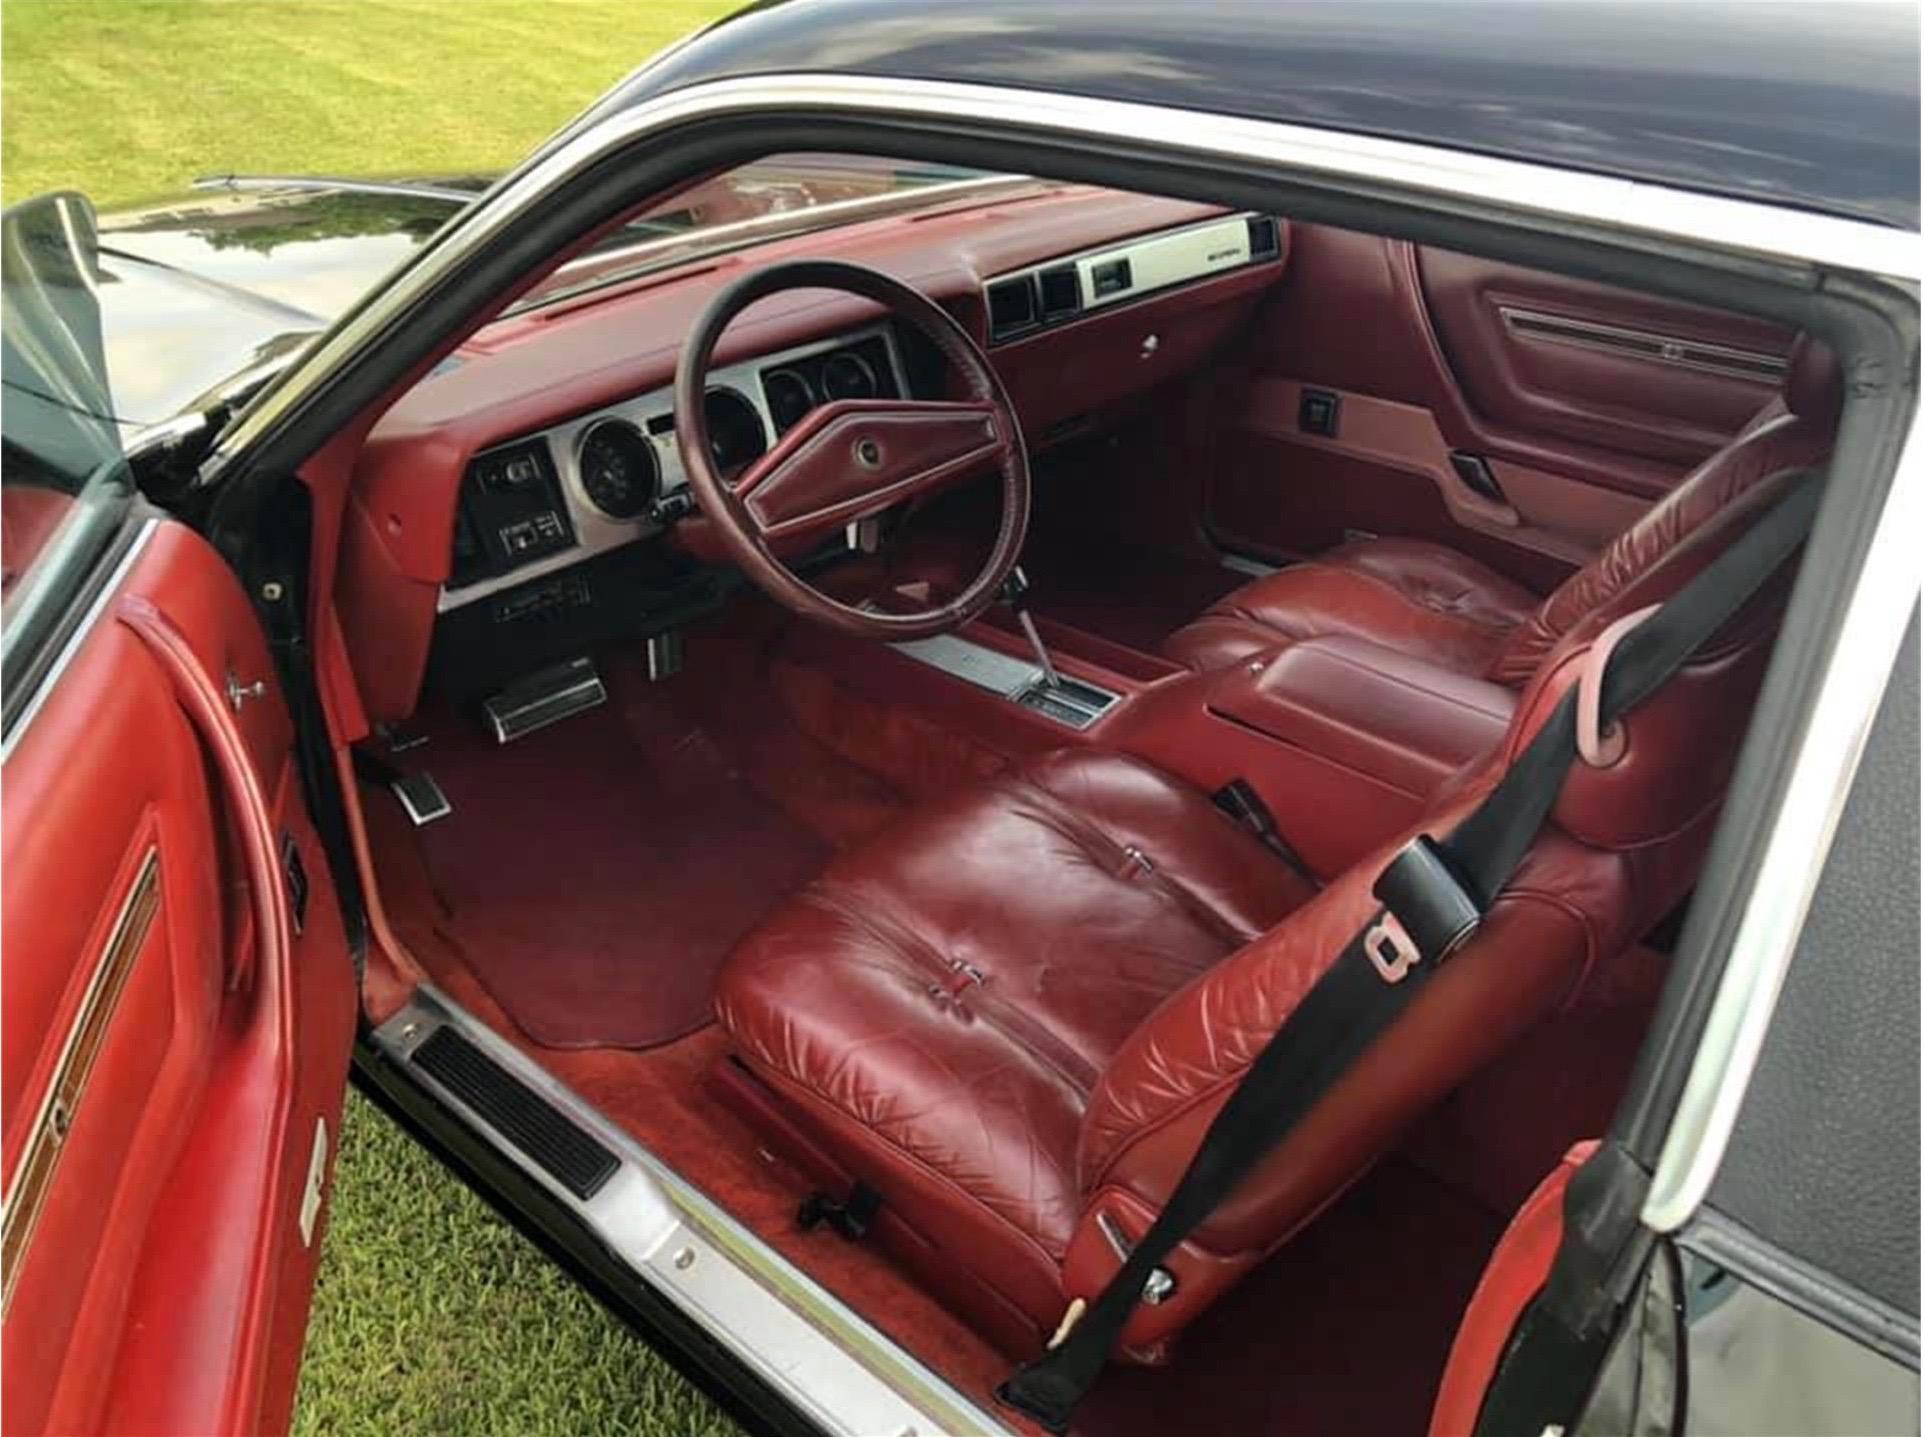 1979 Dodge Magnum GT, Magnum GT was a rare muscle machine for Dodge, ClassicCars.com Journal